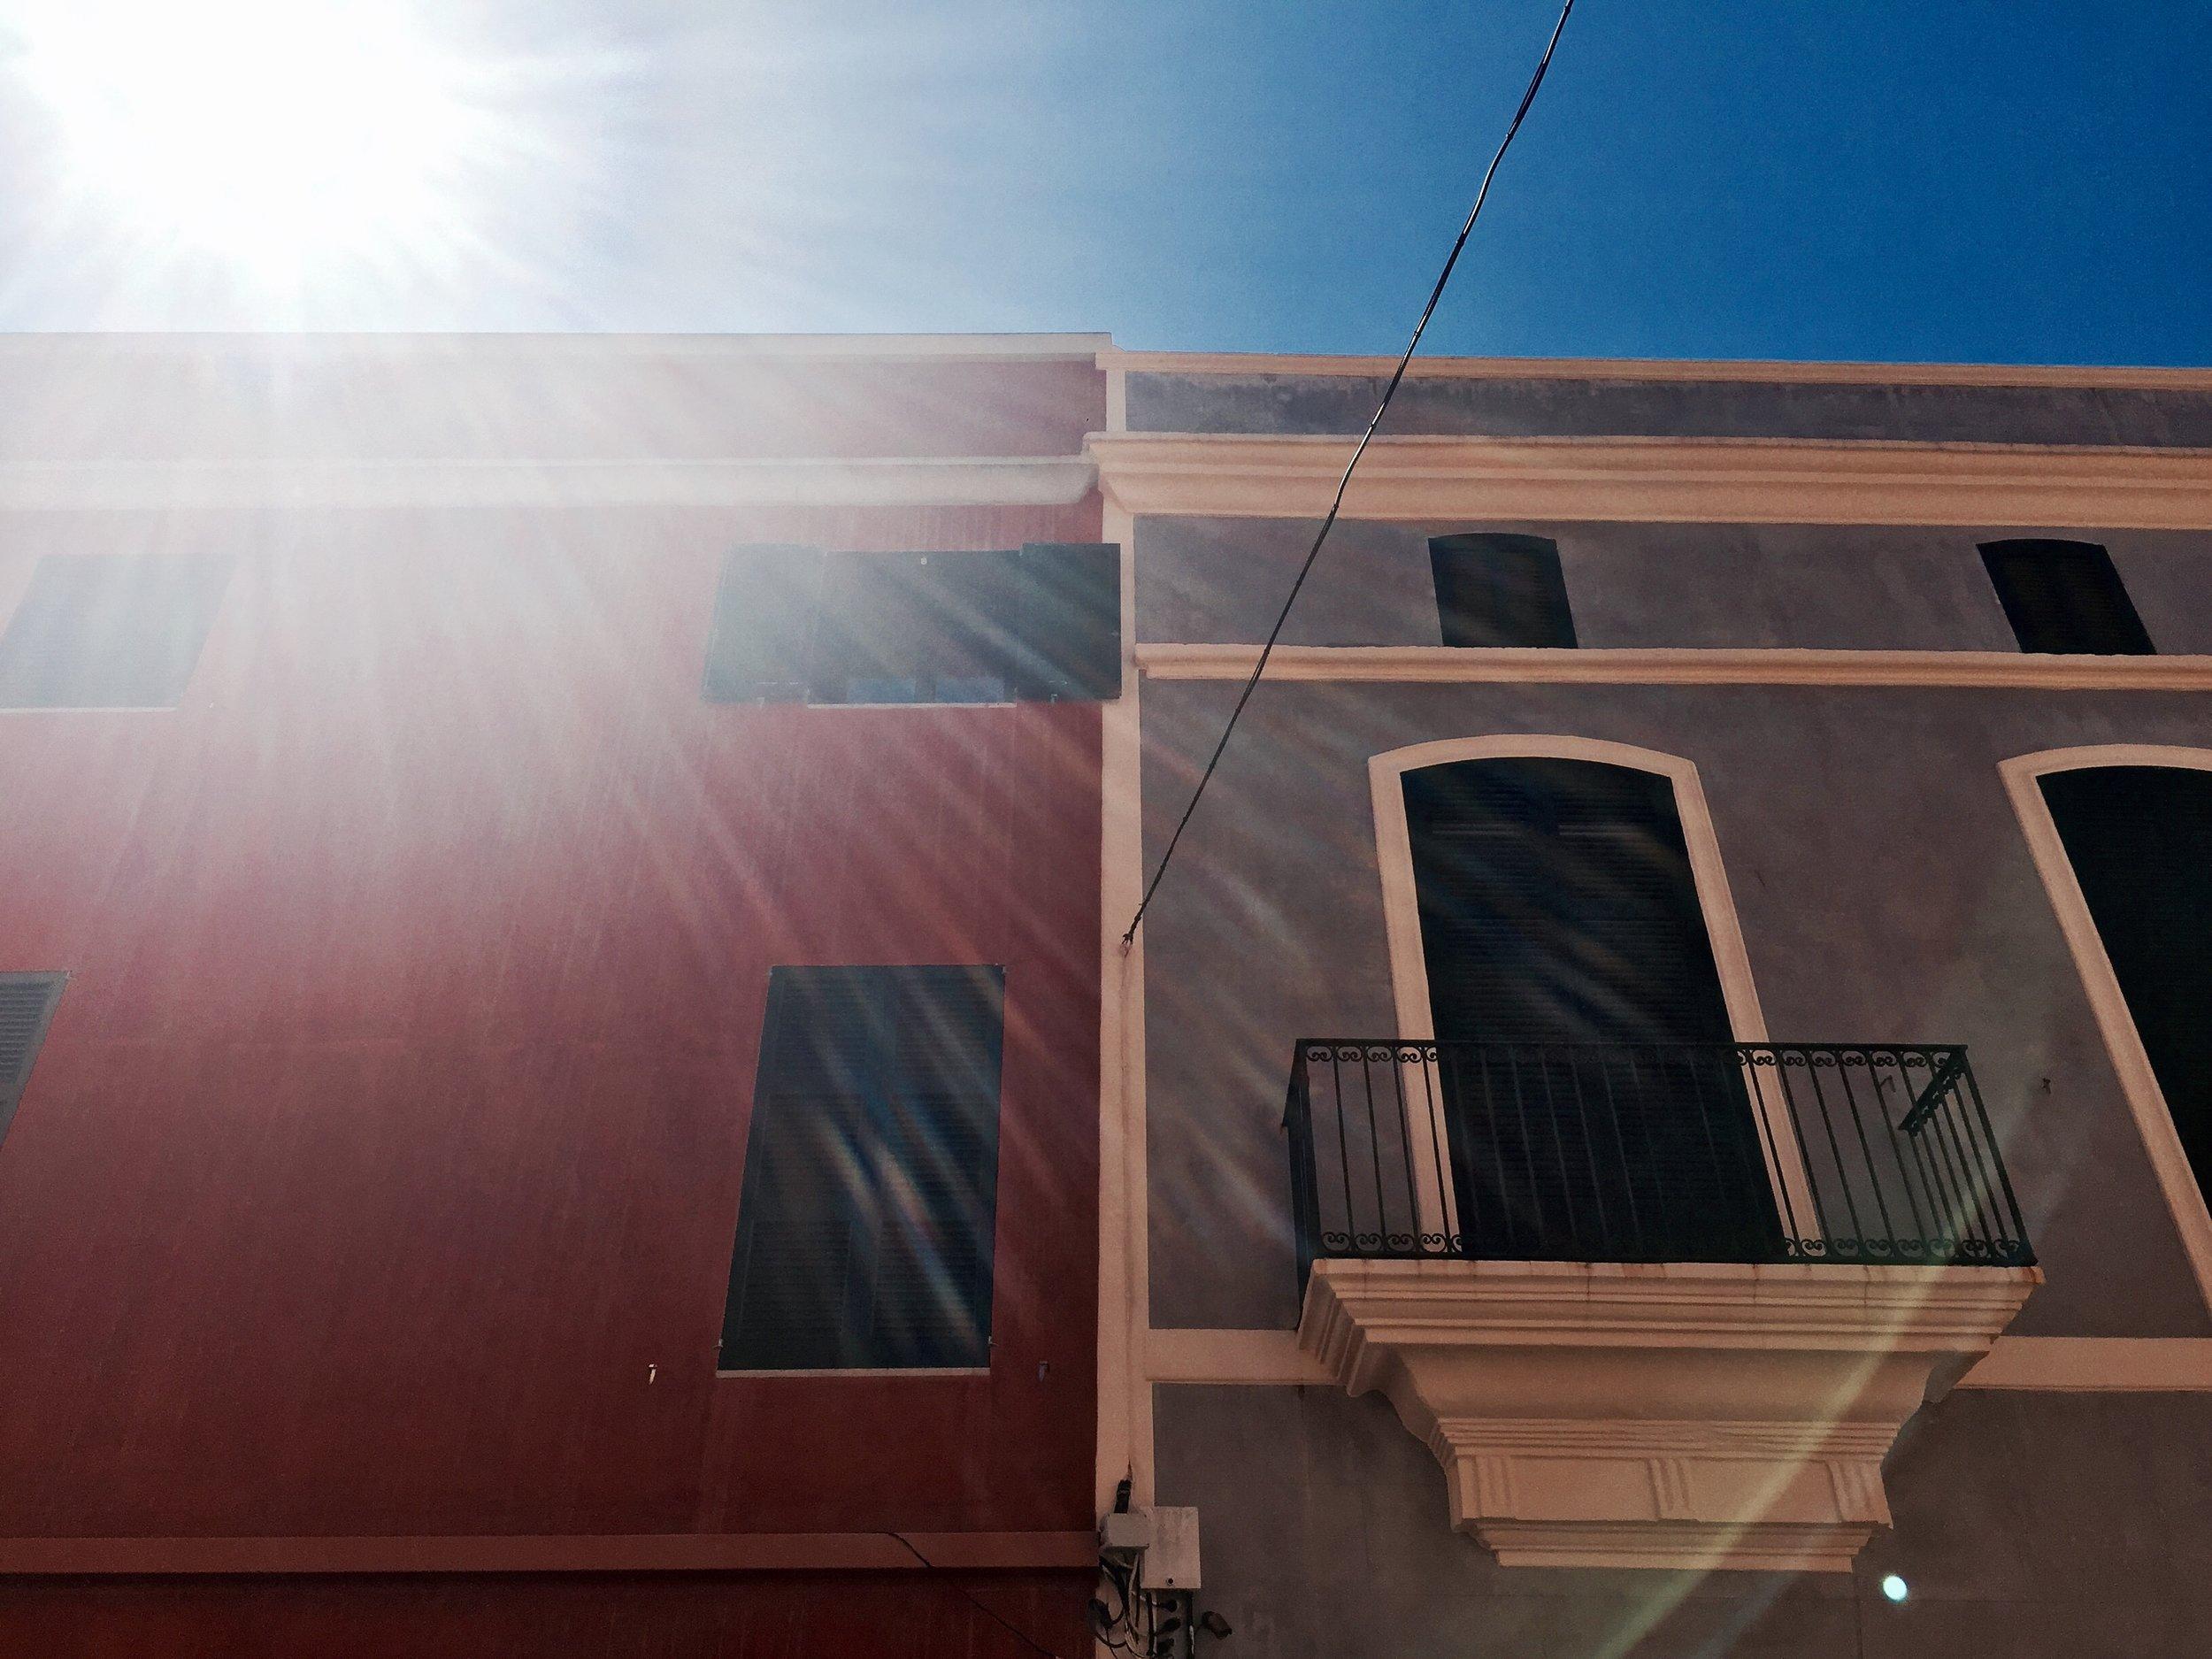 The colorful streets of Ciutadella